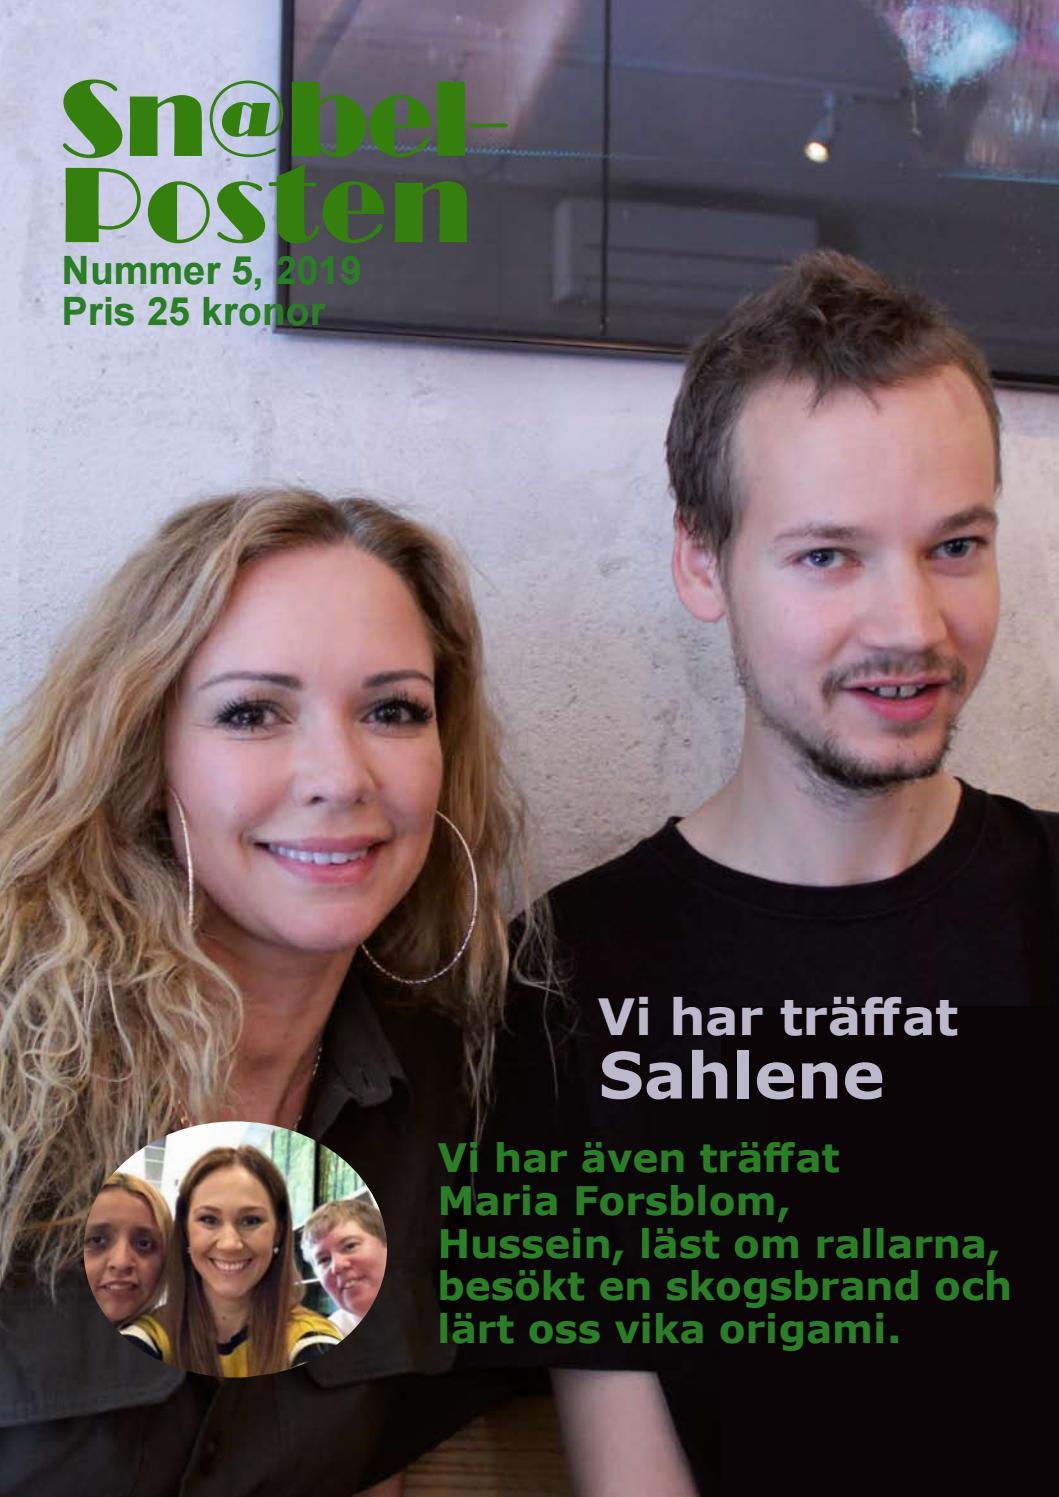 Elina Sderstrm, Borgtppan 8, Surahammar | satisfaction-survey.net